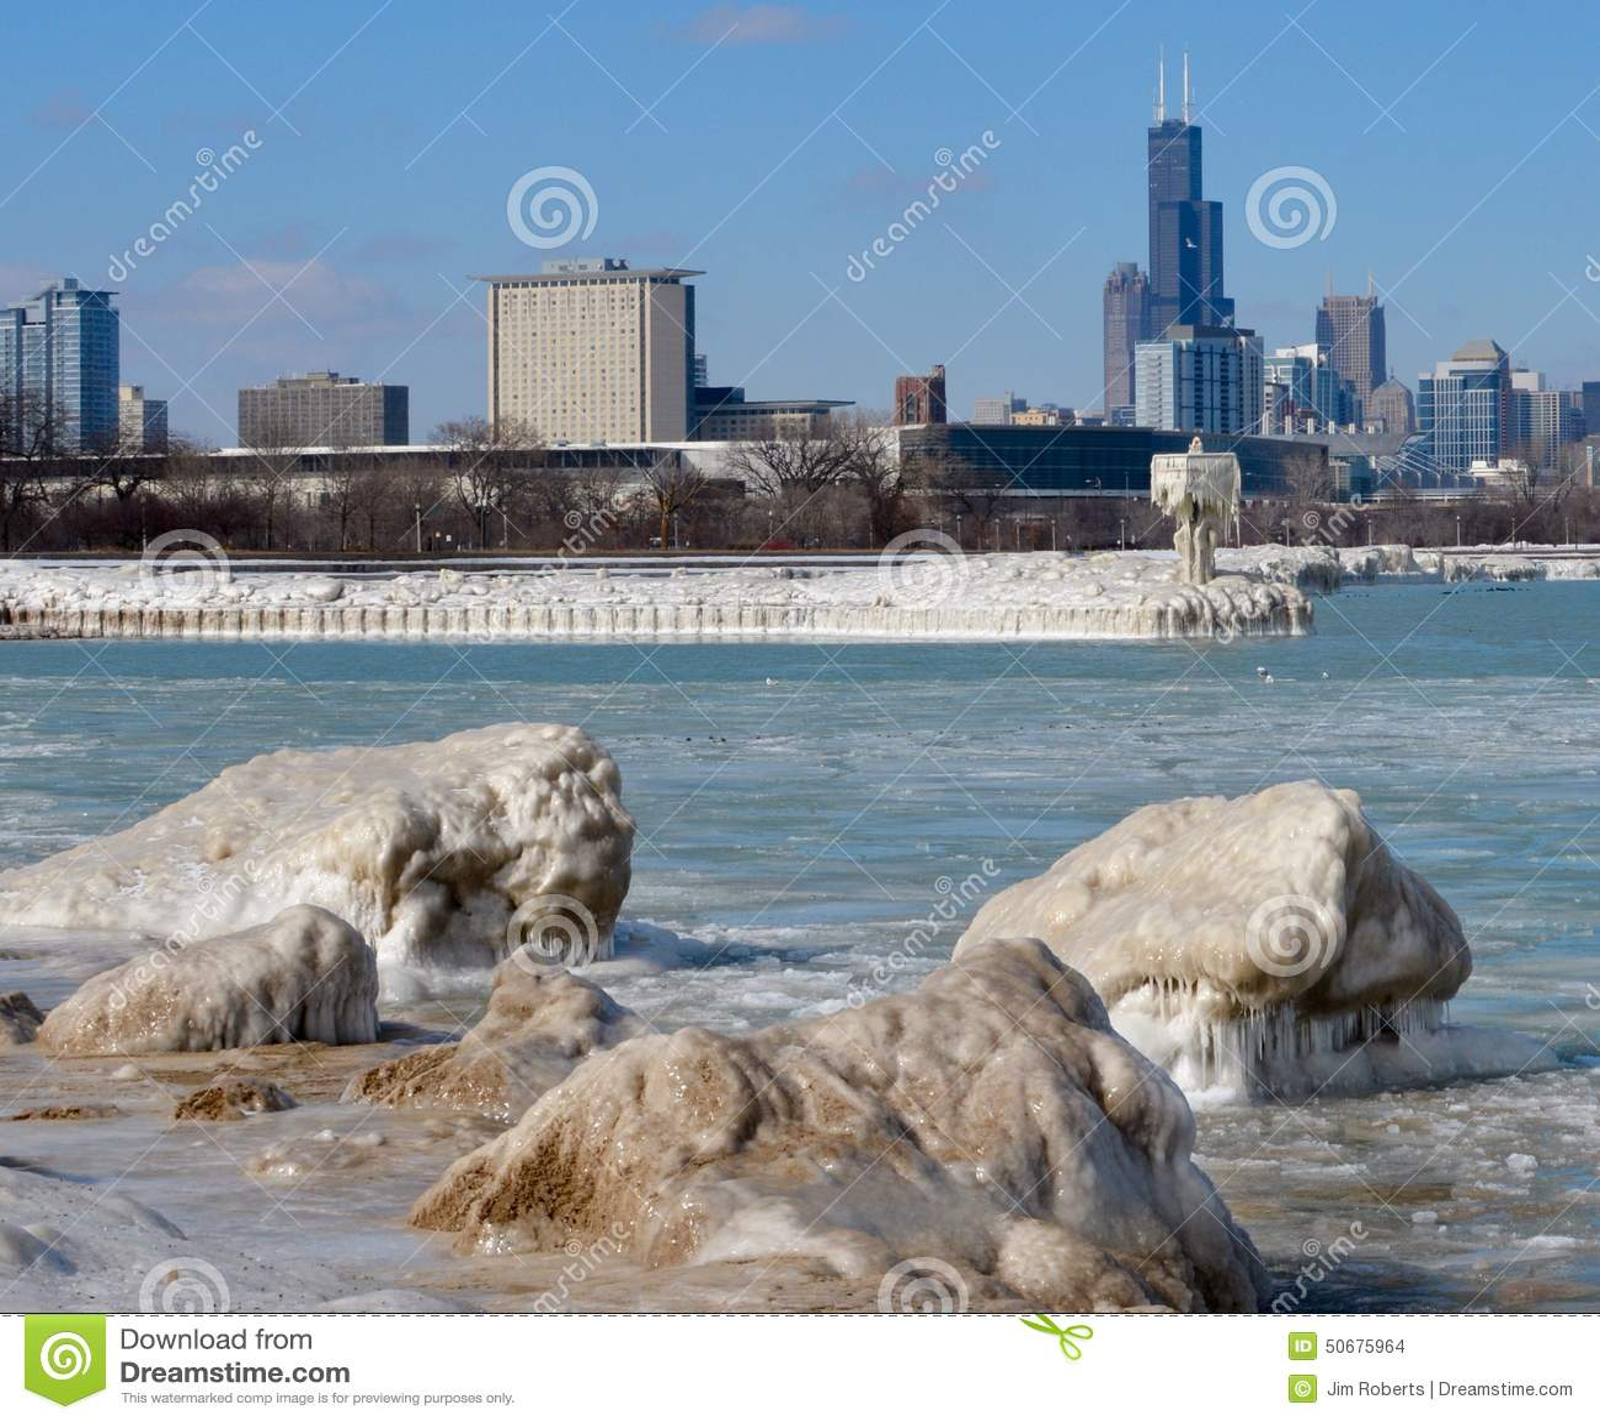 Download 冬天威利斯塔 编辑类库存图片. 图片 包括有 地平线, 芝加哥, 冬天, 2月, 街道, 图标式, 伊利诺伊 - 50675964